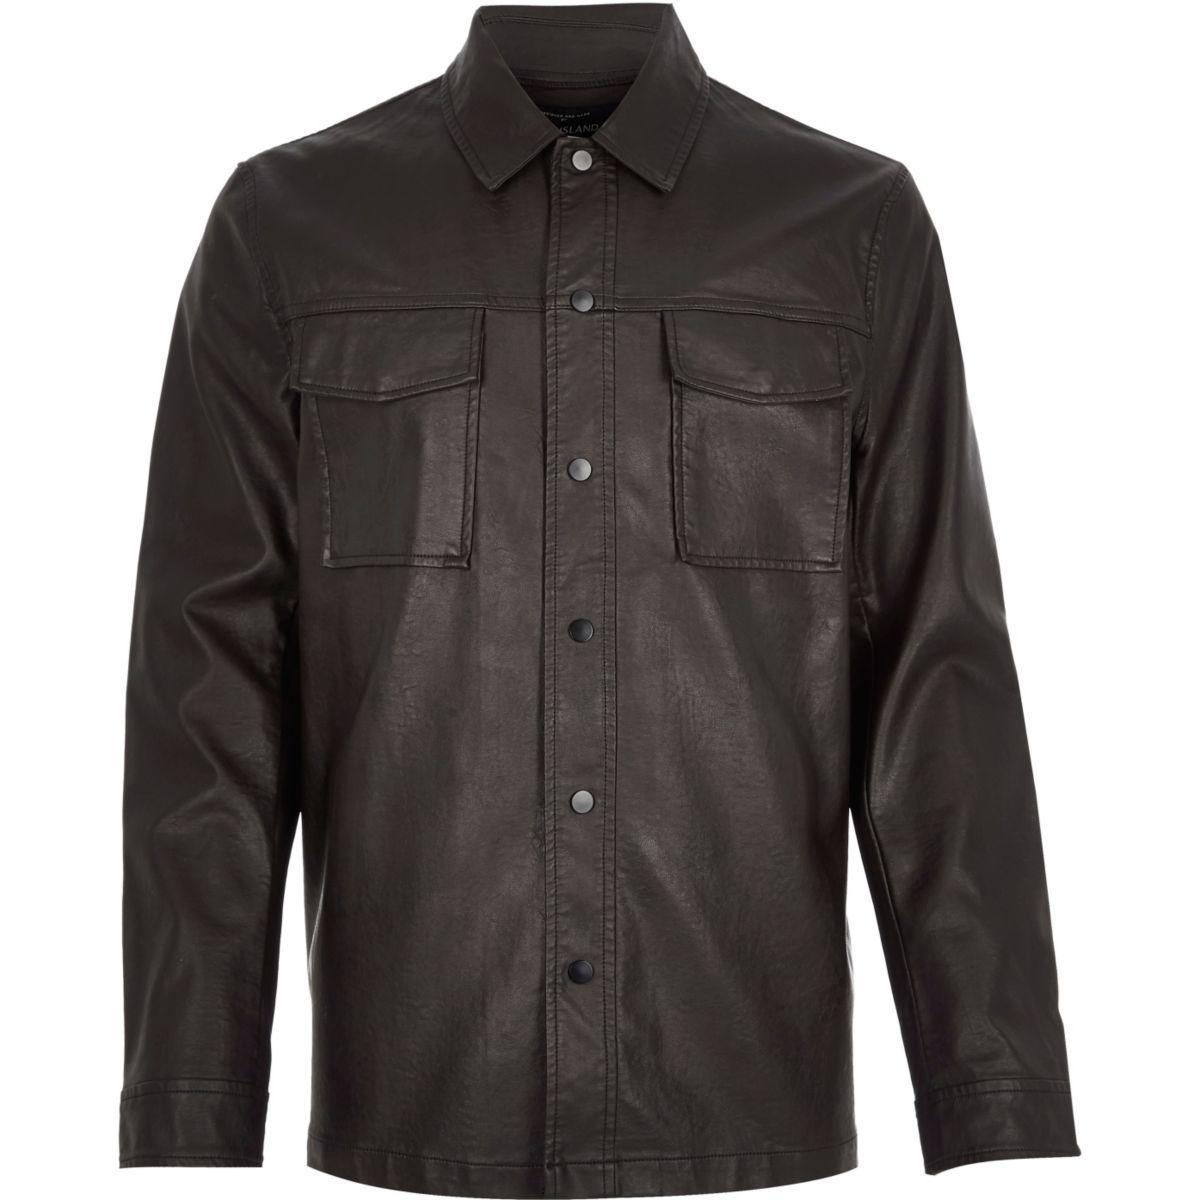 Dark brown leather look shirt jacket